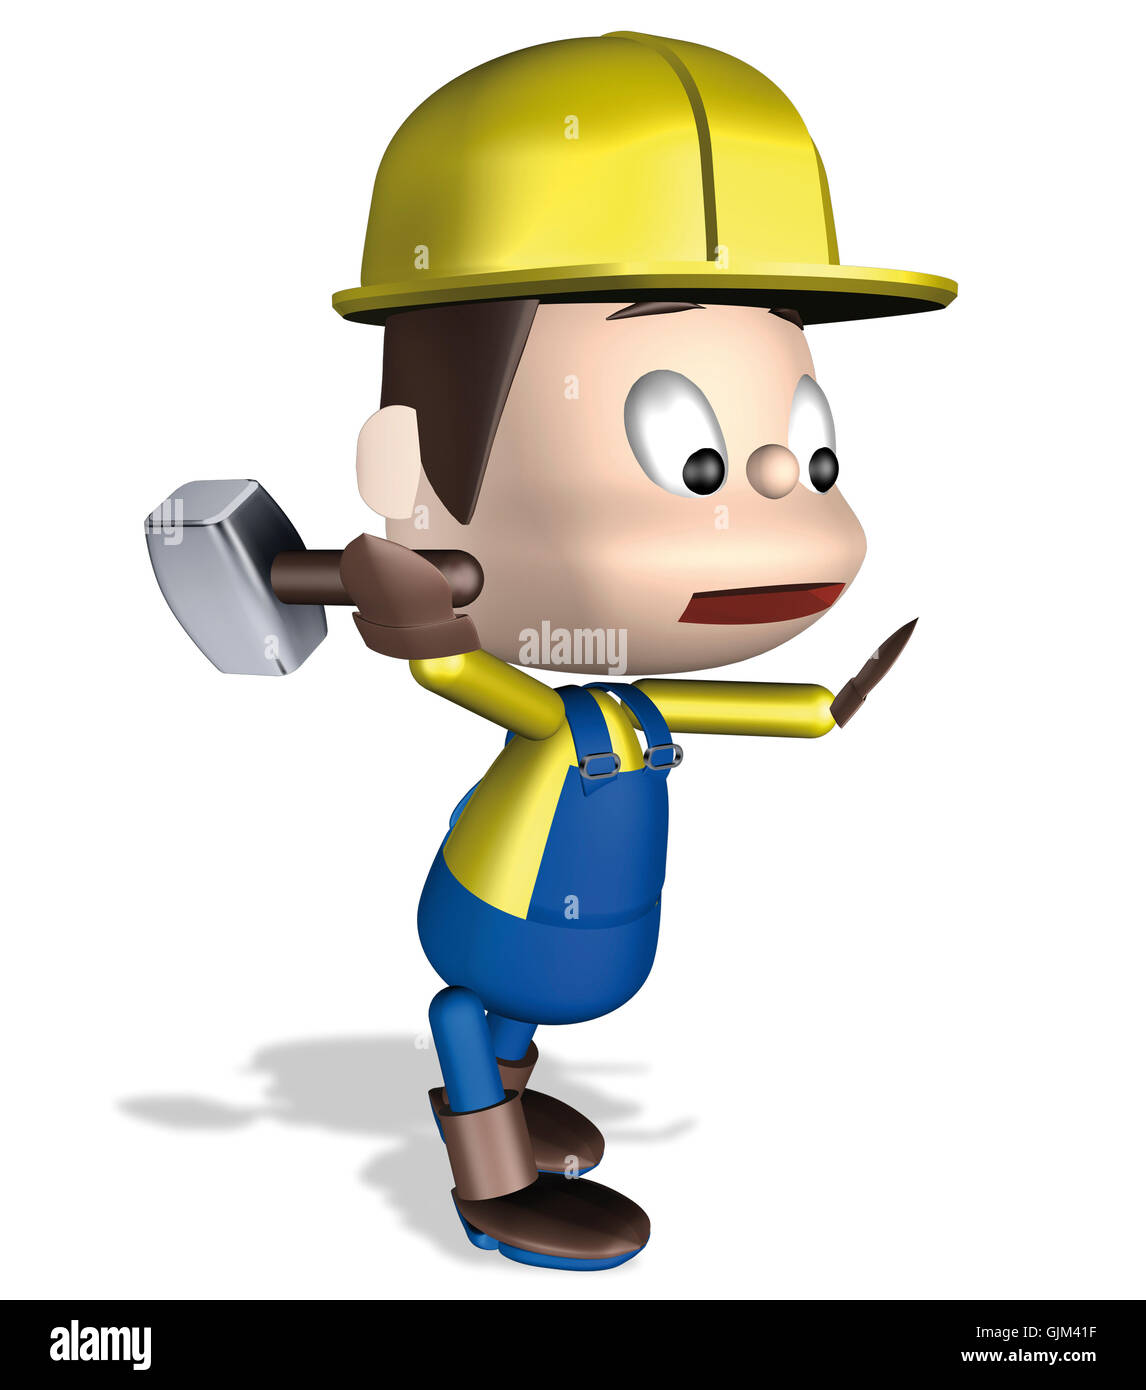 Worker hammer - Stock Image